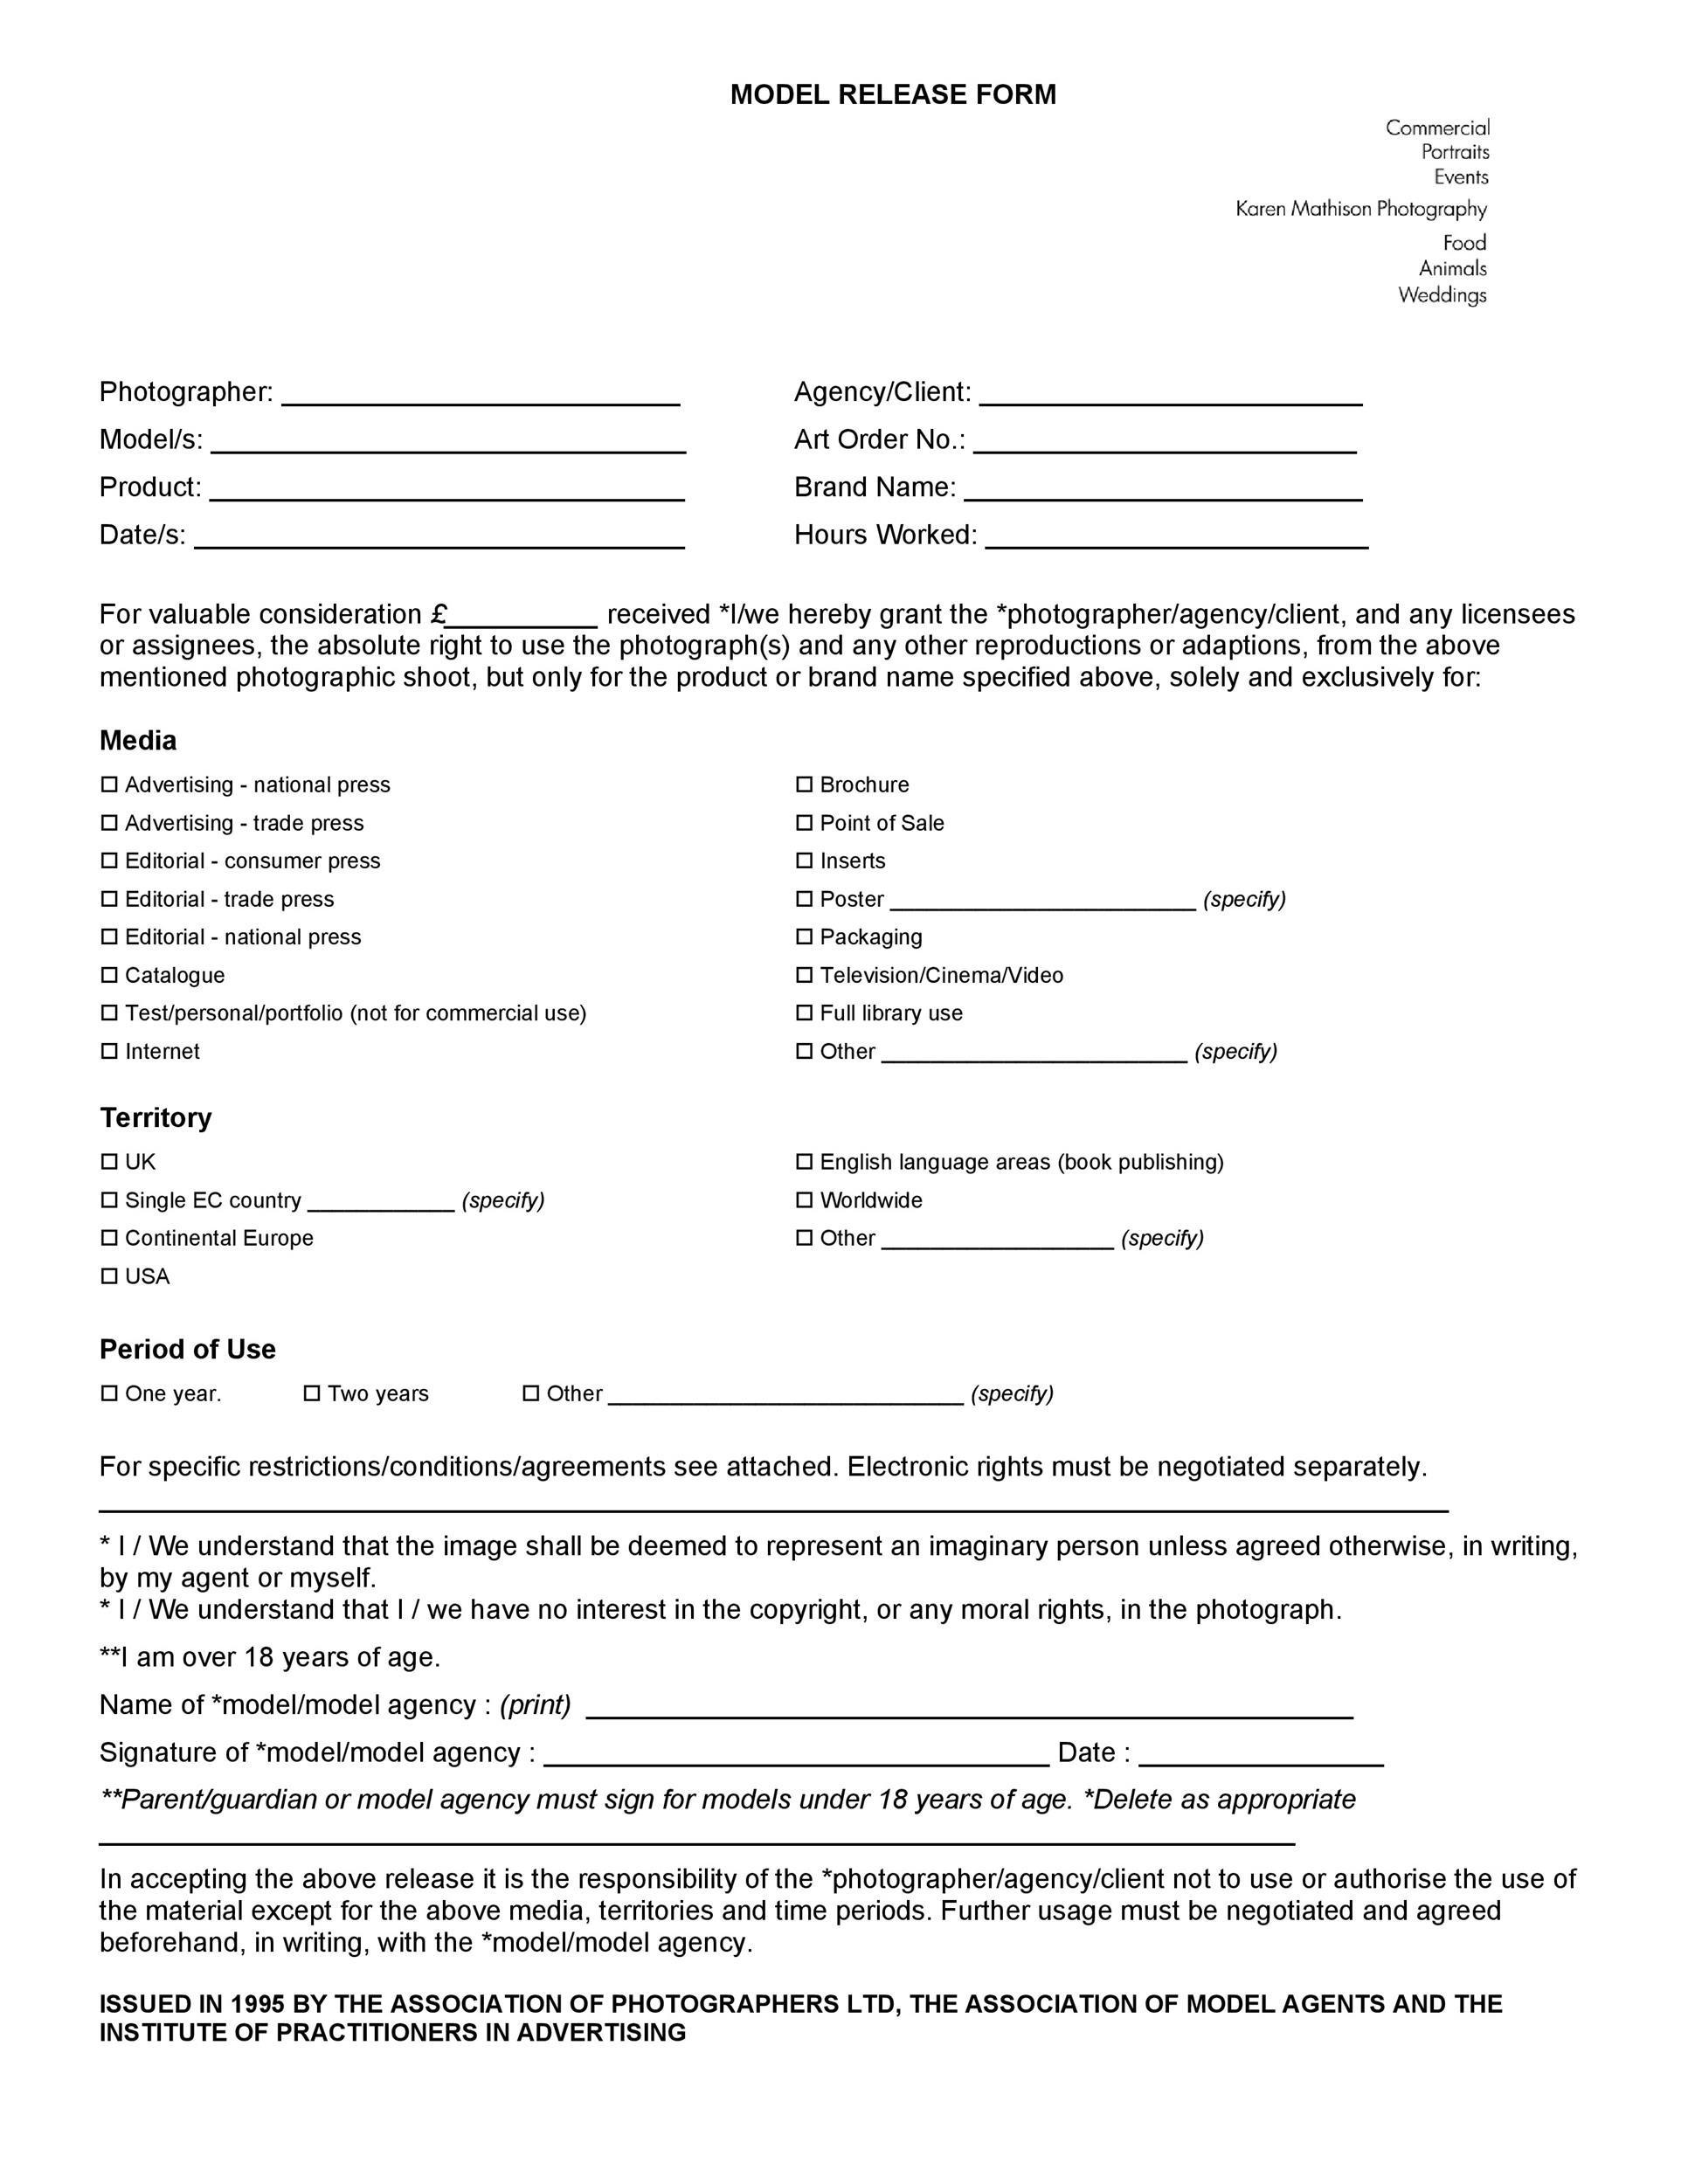 Free model release form 37